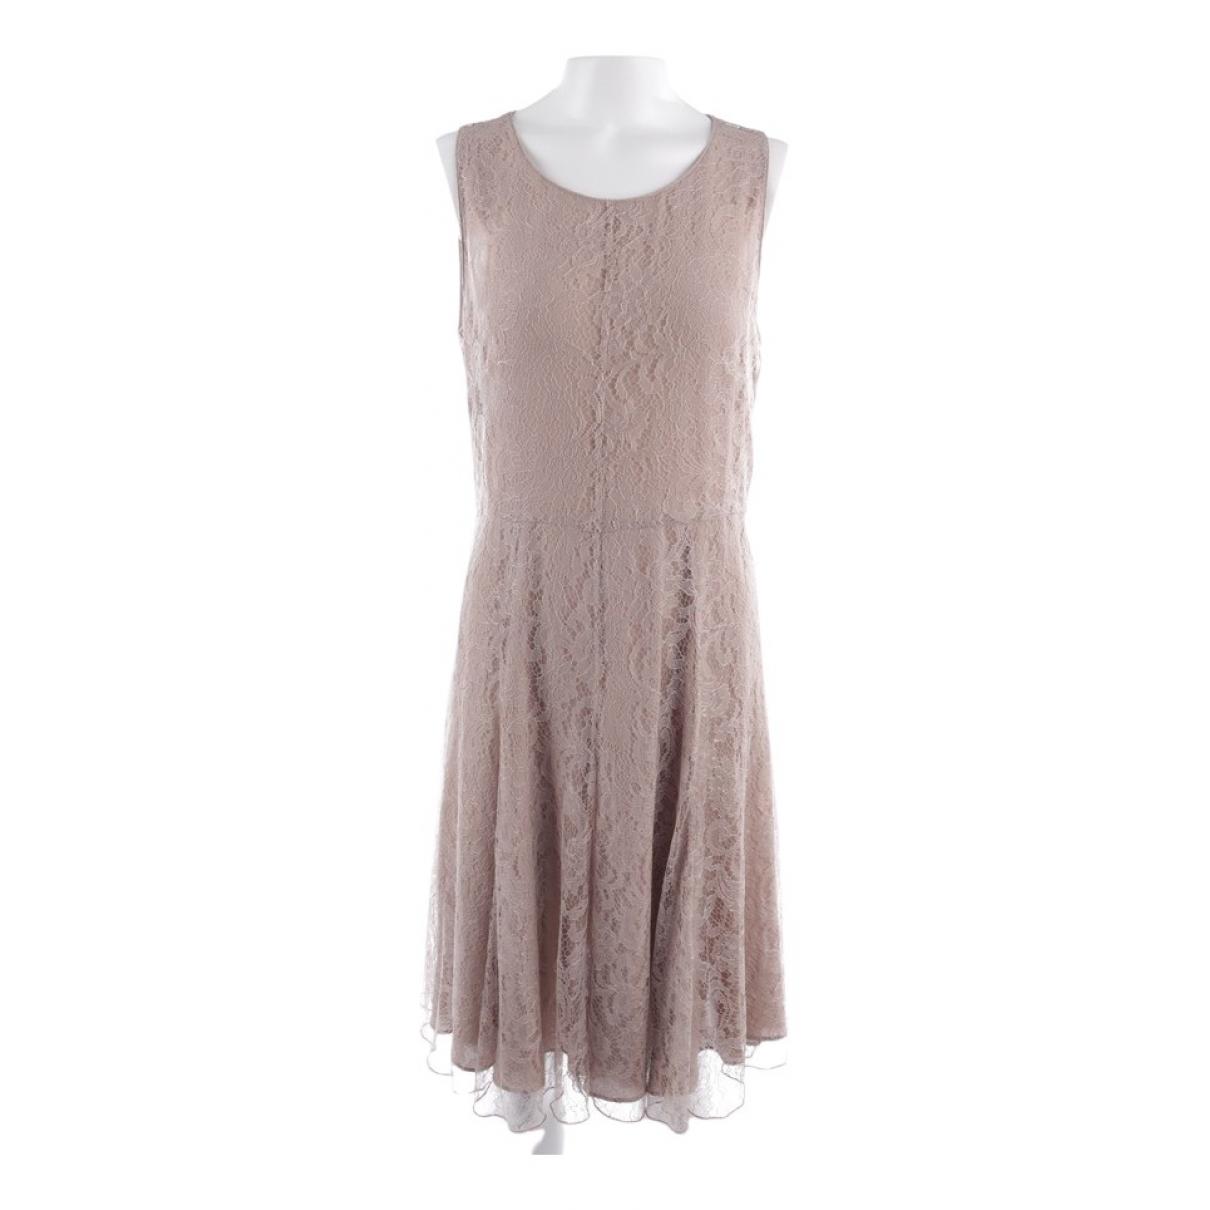 Burberry \N Beige Cotton dress for Women 34 FR